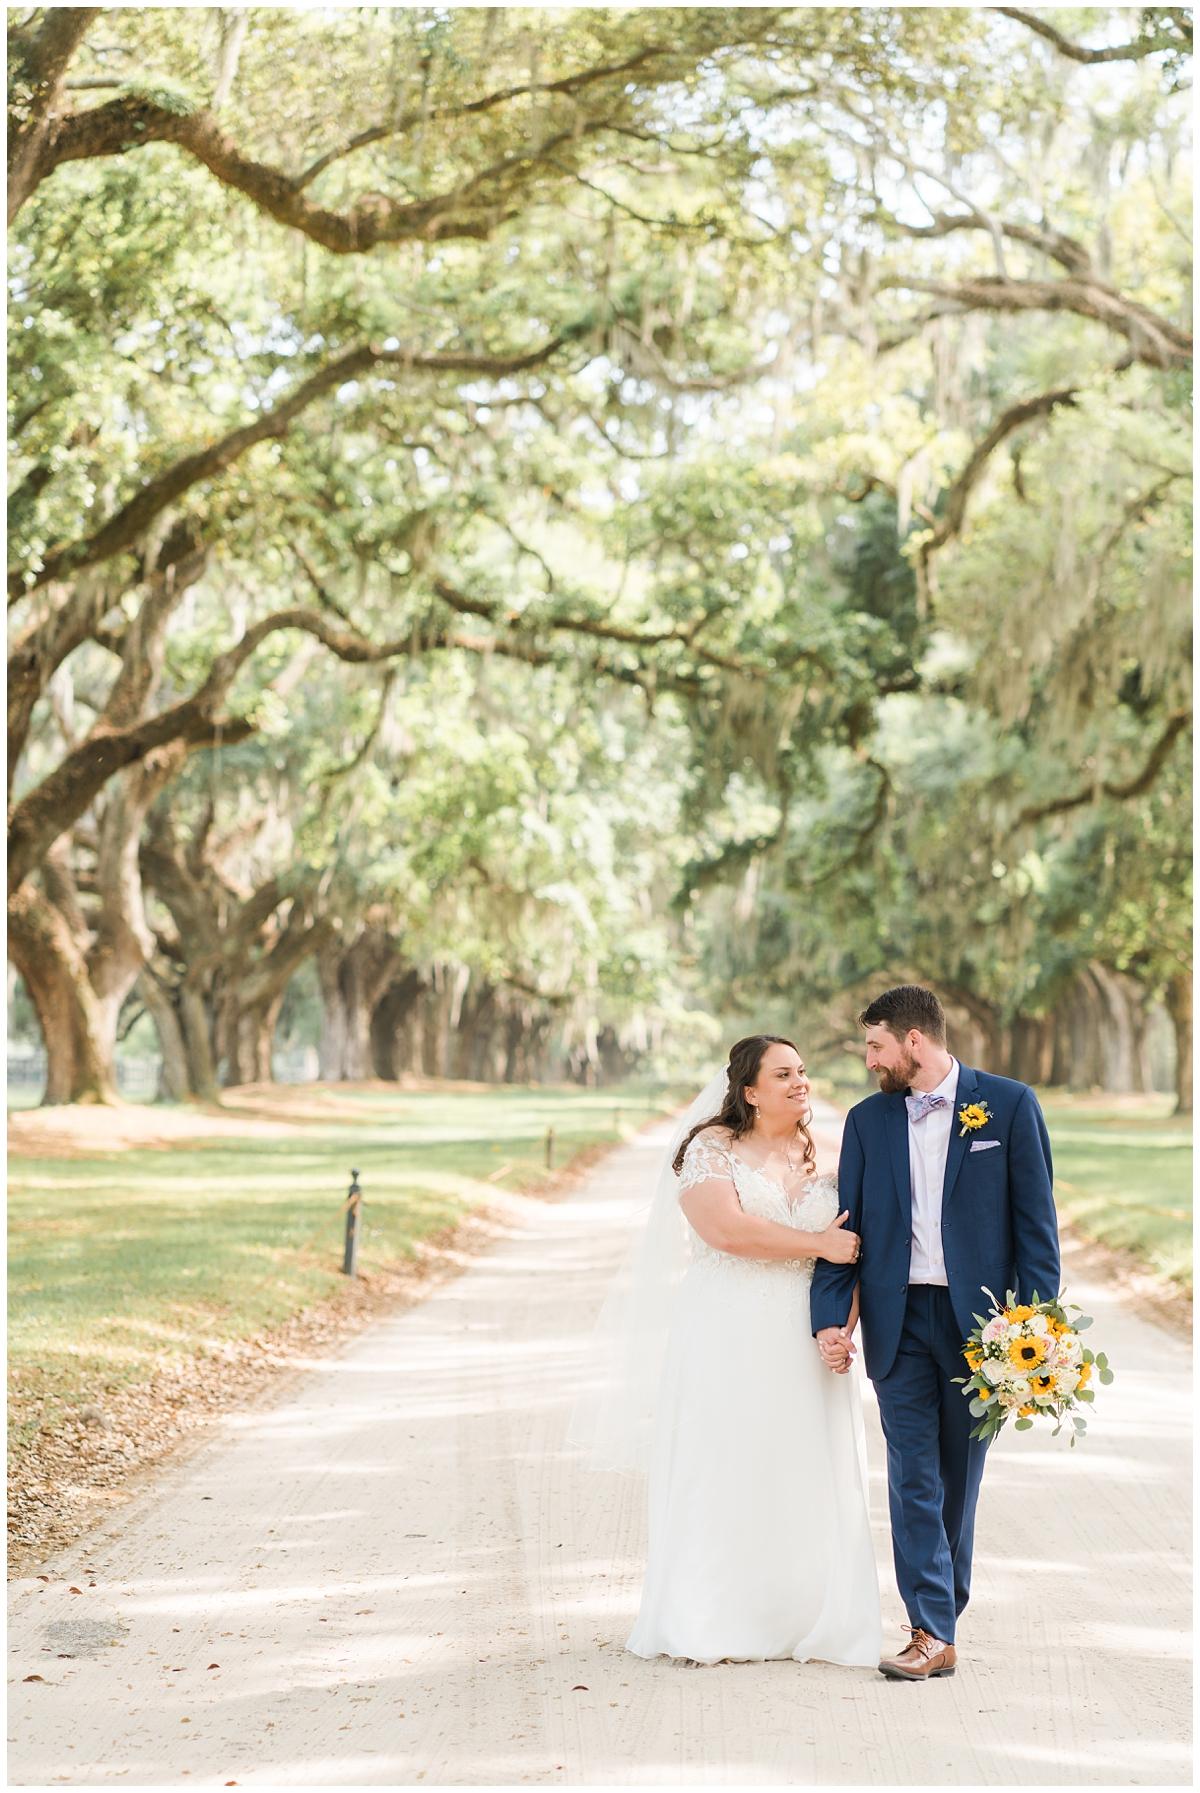 newlyweds walk outside Boone Hall during spring wedding photos